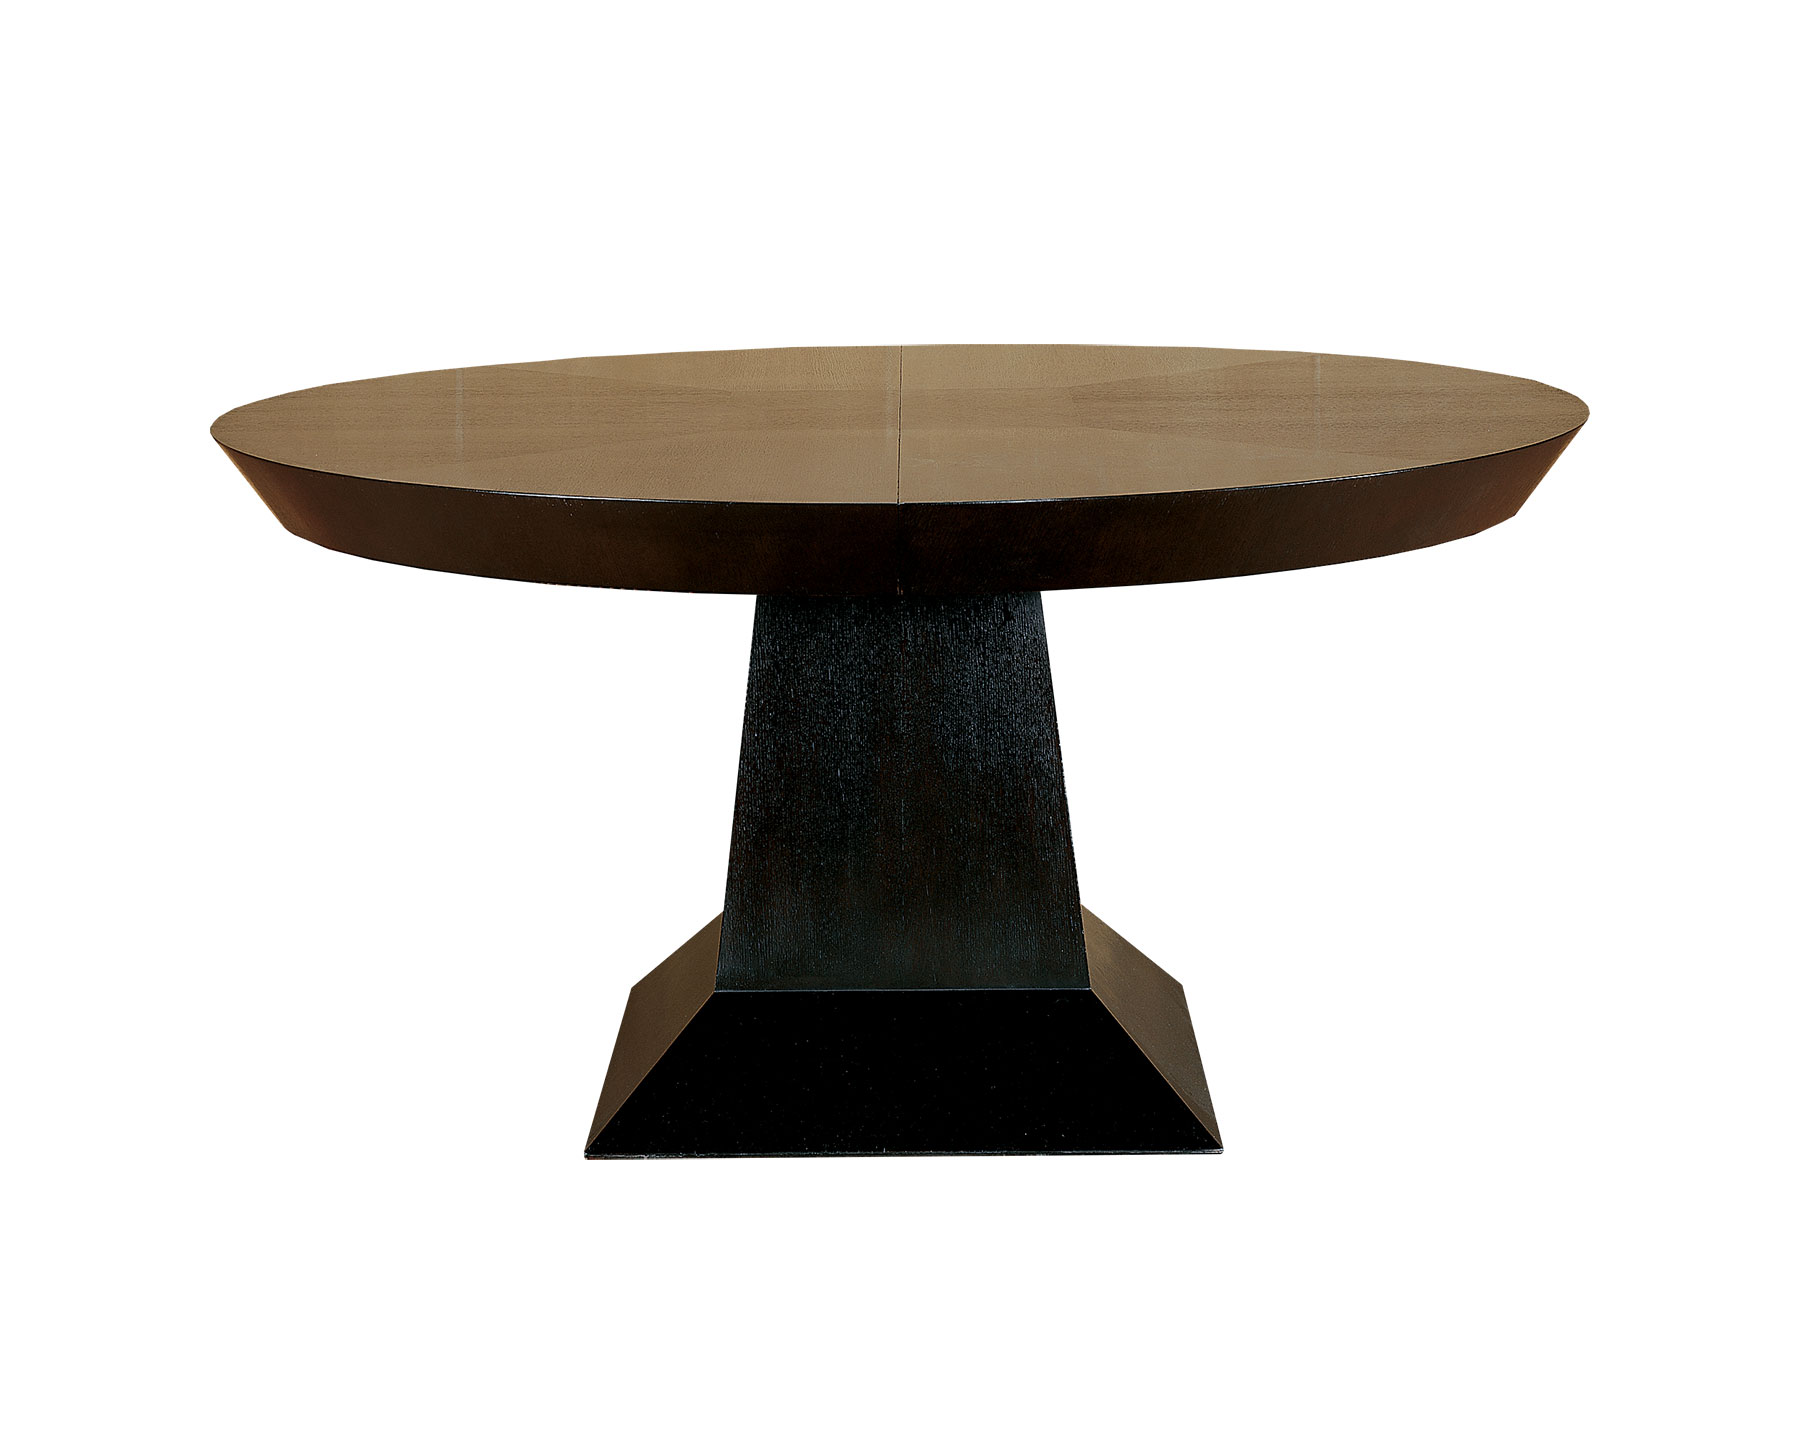 Klismos Dining Table Emanuel Morez : Klismos DT from emanuelmorez.com size 1800 x 1440 jpeg 145kB